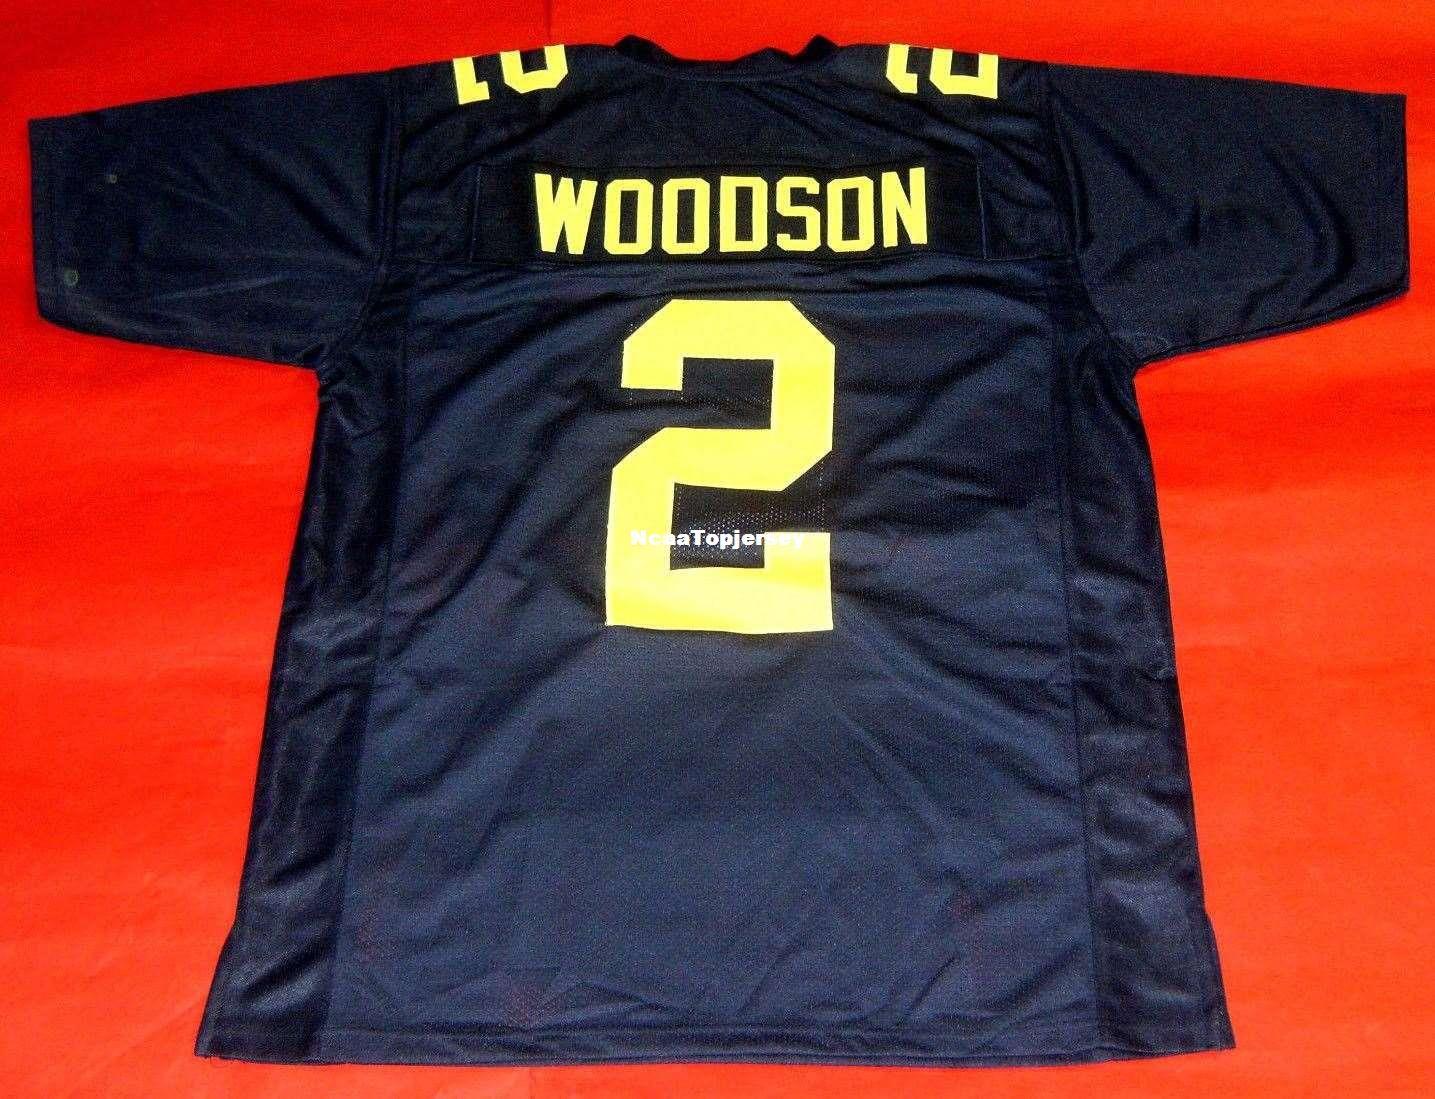 online retailer b92b5 a2072 Cheap retro #2 CHARLES WOODSON MICHIGAN WOLVERINES SH JERSEY Stitching  Retro Football jerseys Fat man Big And Tall 4XL 5XL 6XL For sale